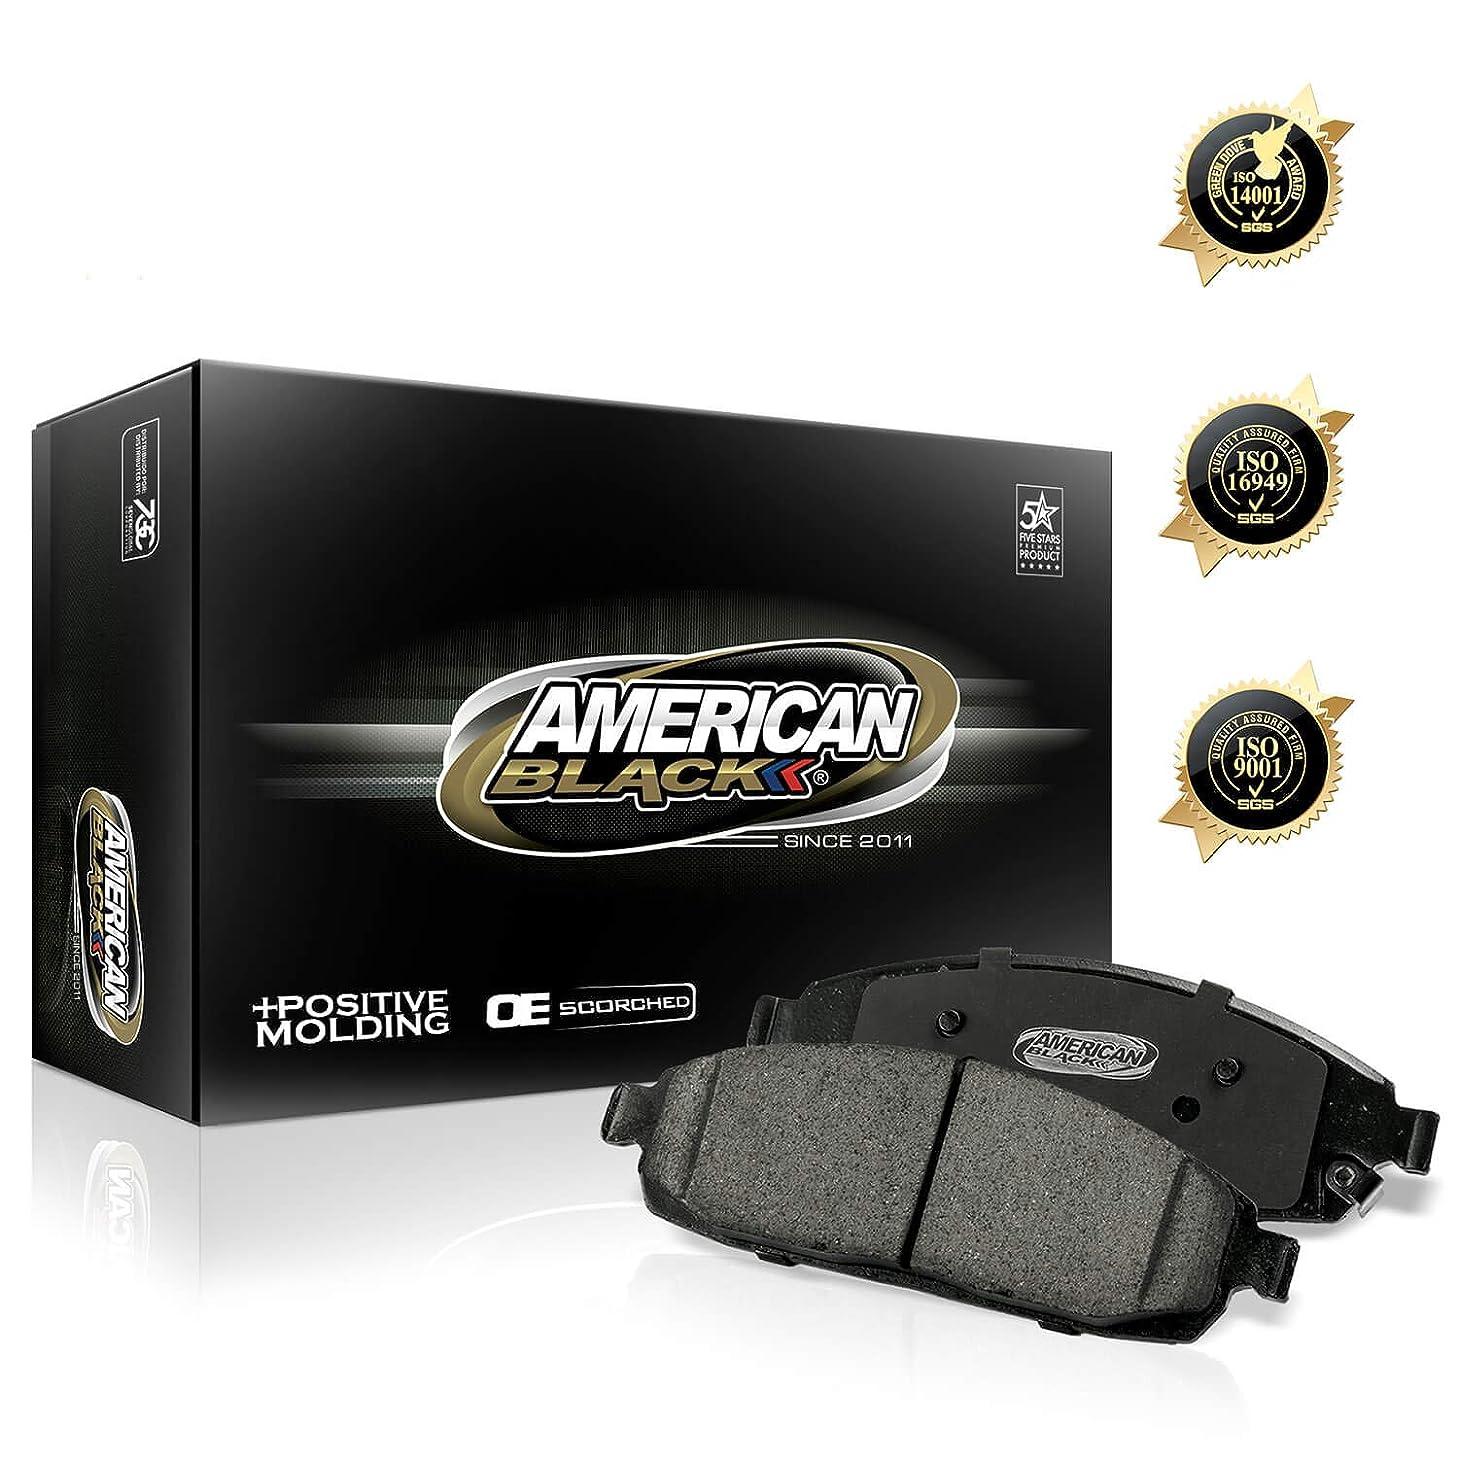 American Black ABD1264C Professional Ceramic Front Disc Brake Pad Set Compatible With Chevrolet Equinox/Pontiac Torrent/Saturn Vue/XL-07 - OE Premium Quality - Perfect fit, Quiet and DUST FREE